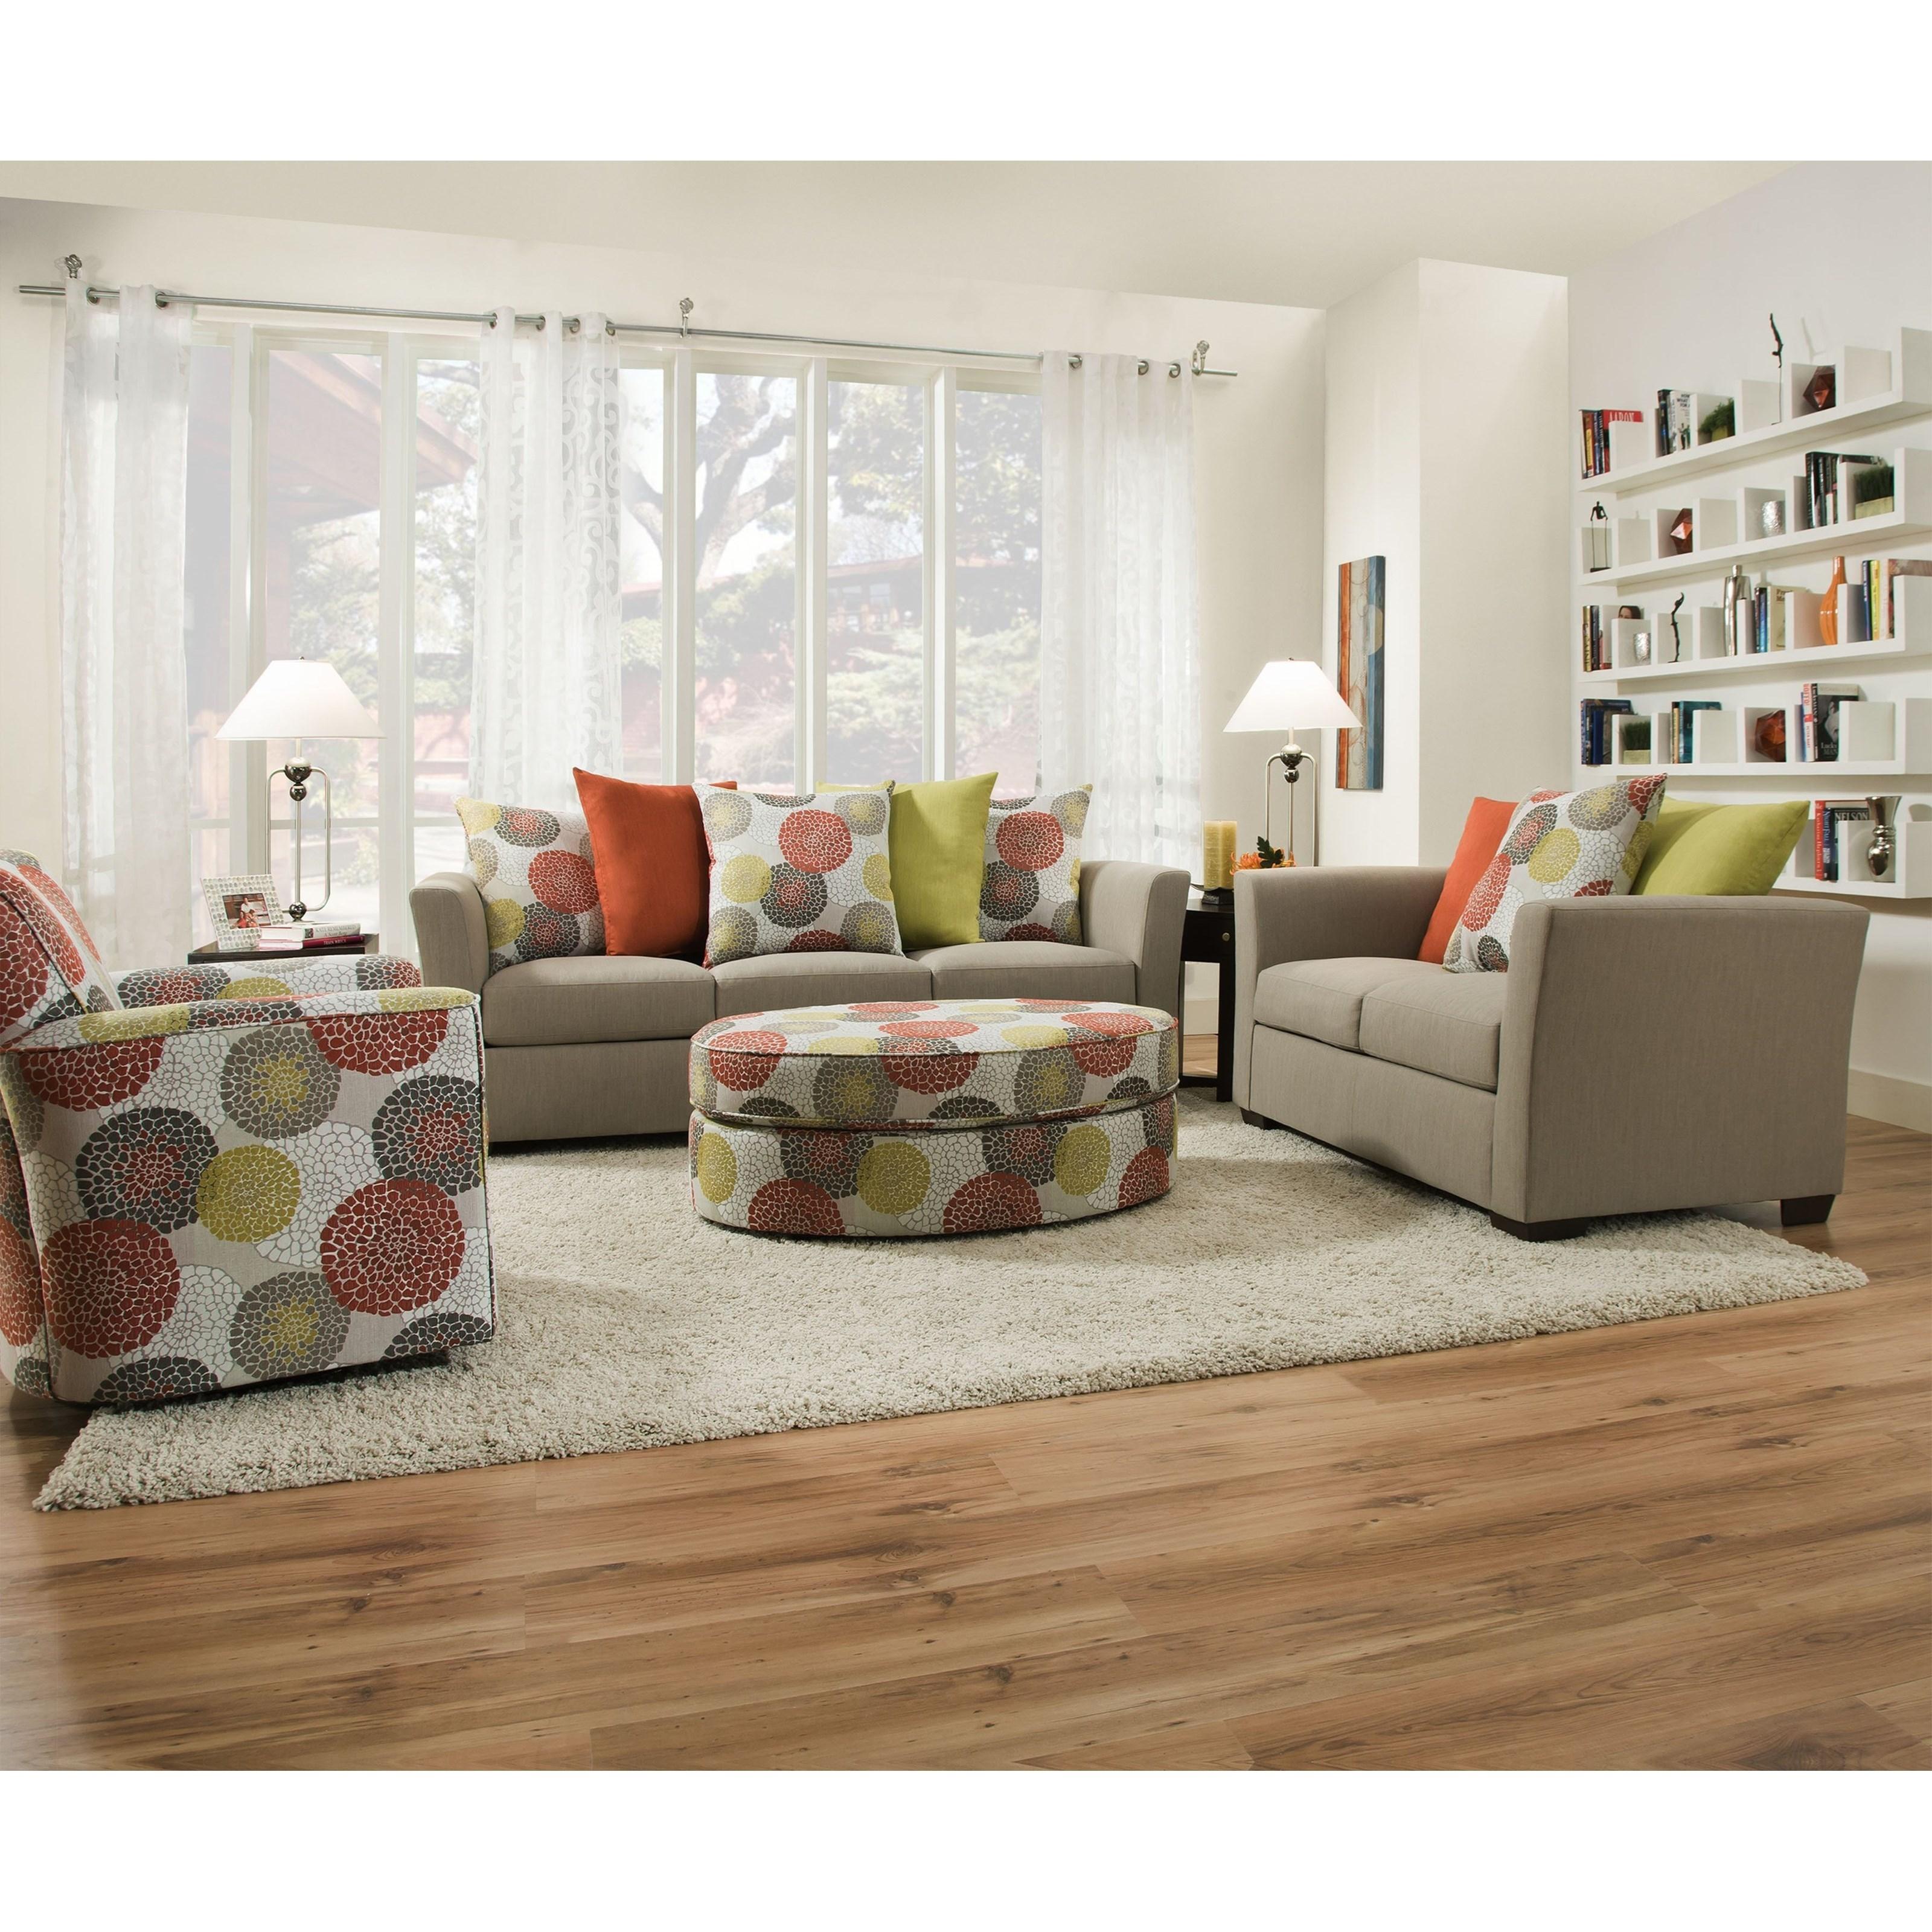 United Furniture Industries 1720 Sofa: United Furniture Industries 4201 4201Sofa-FrenchGray